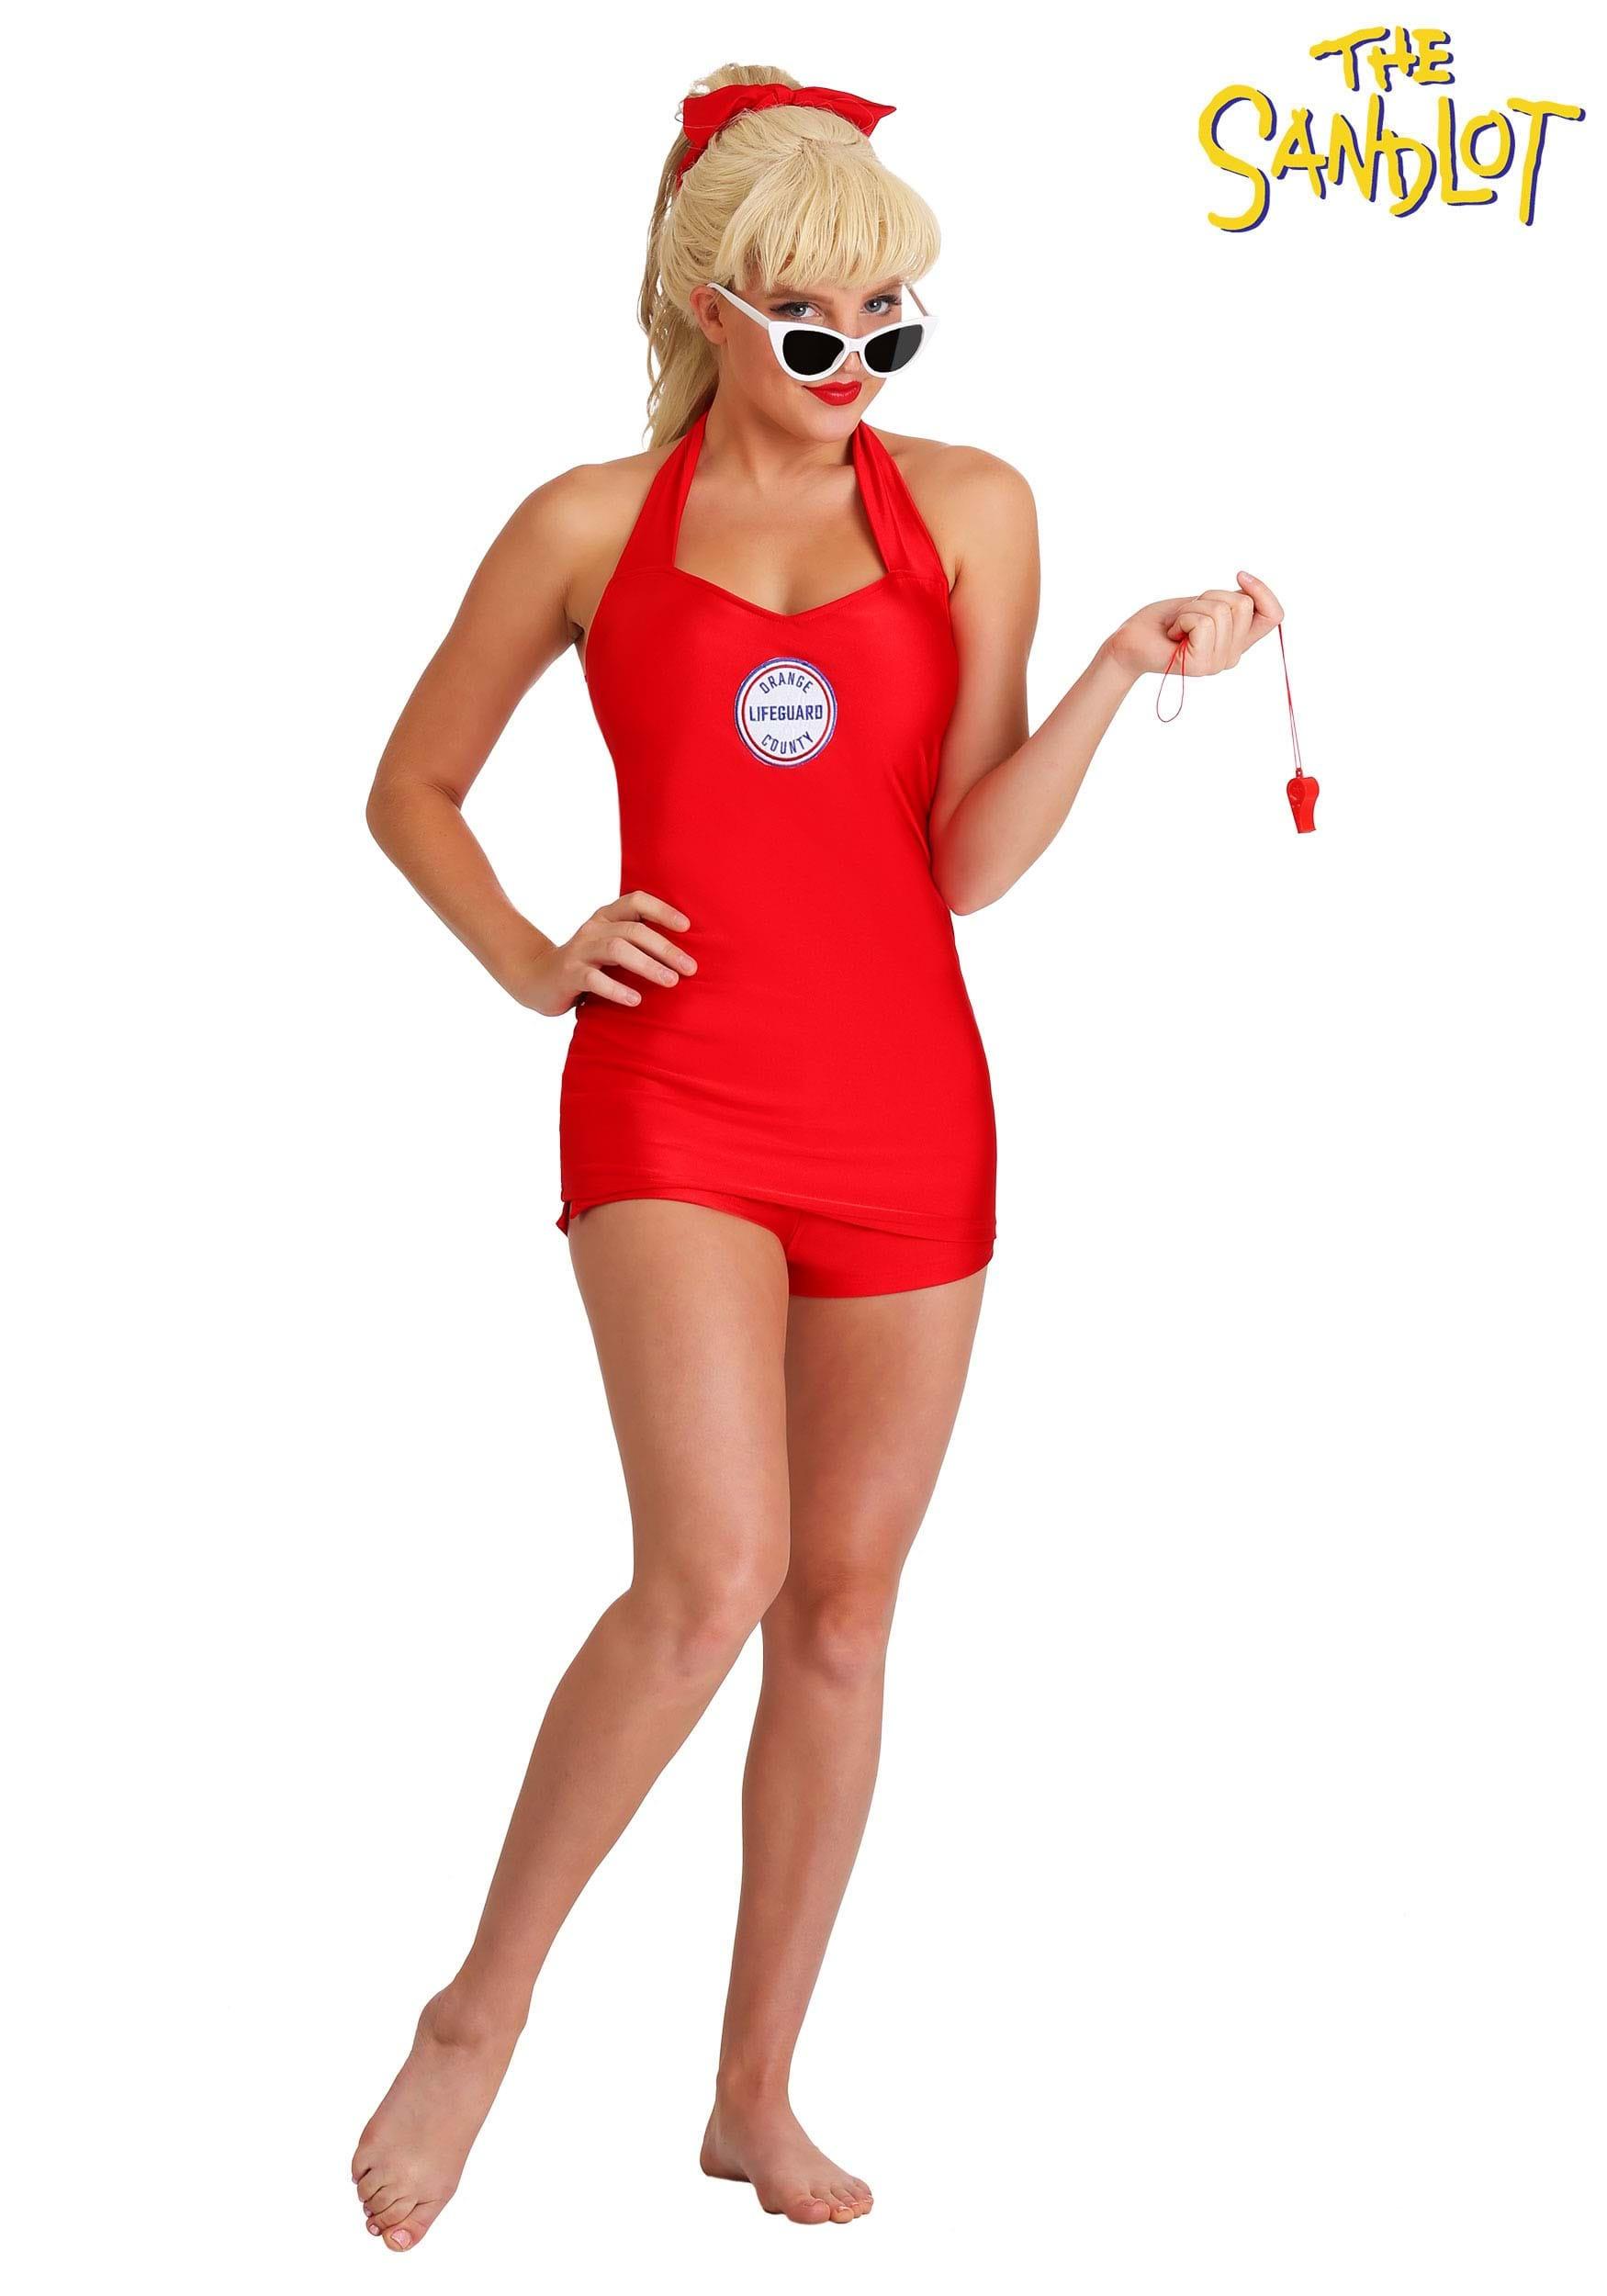 wendy peffercorn adult sandlot costume1